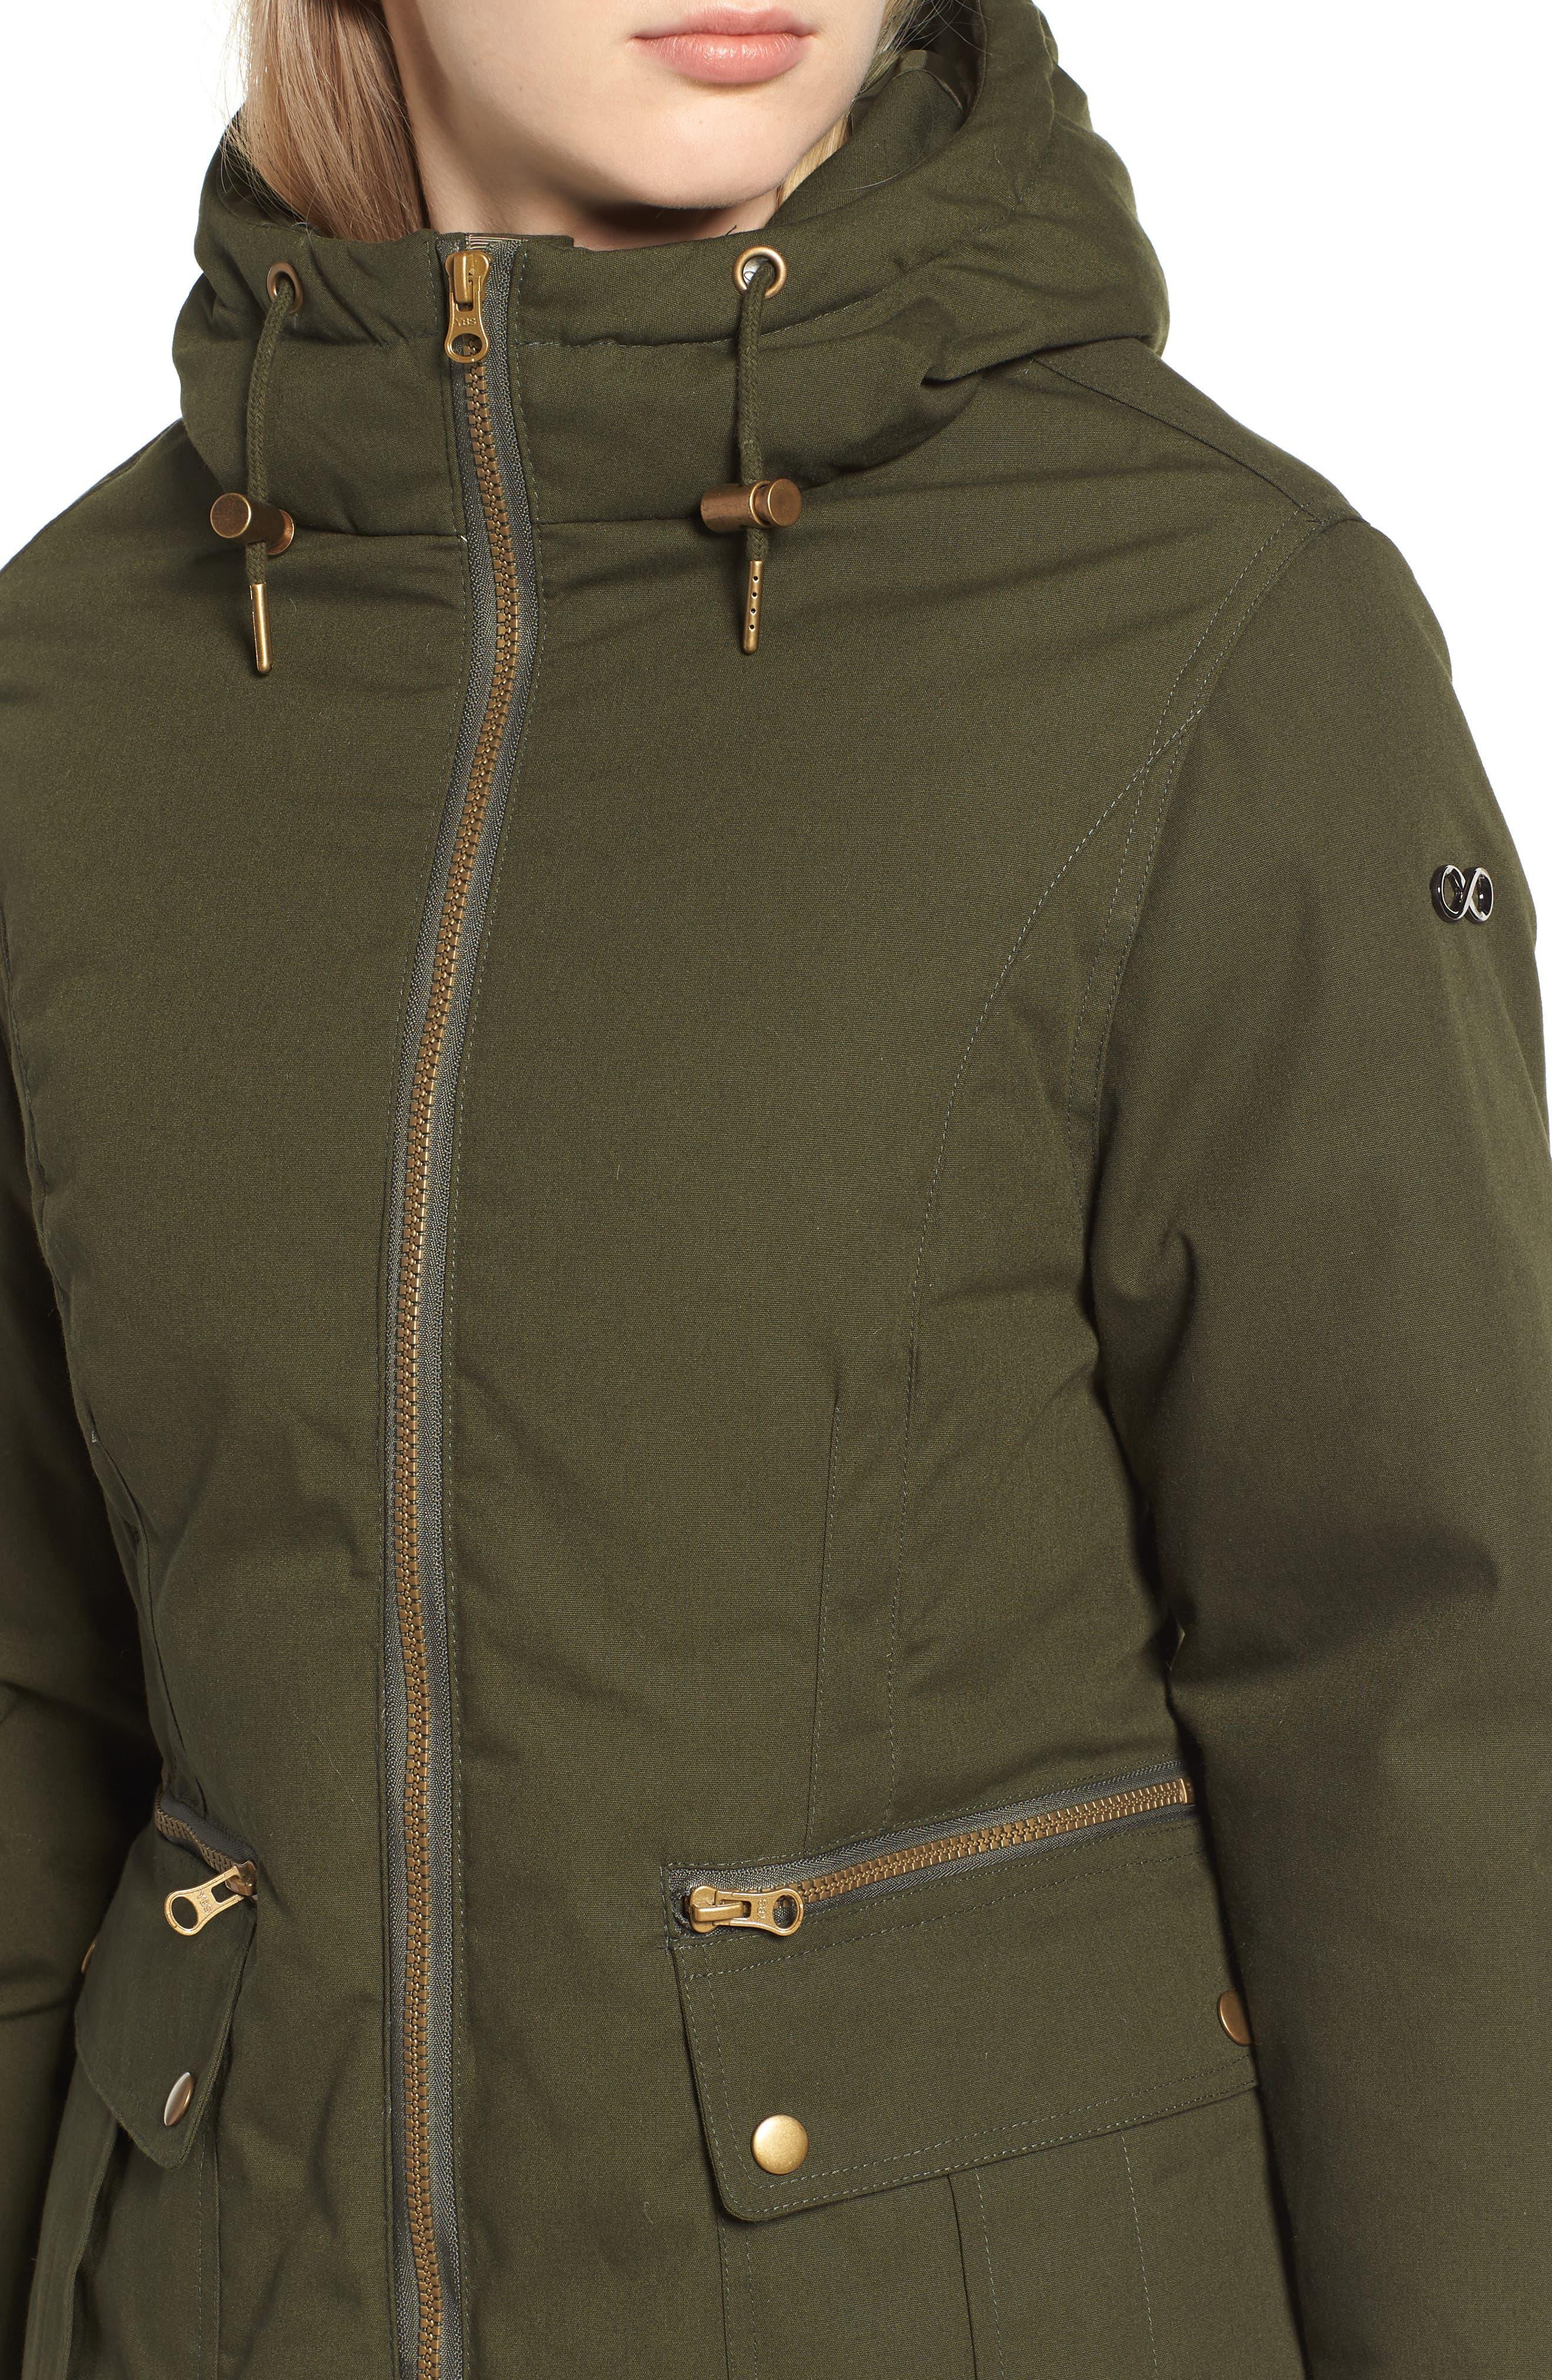 Convertible Down 3-in-1 Maternity Jacket,                             Alternate thumbnail 6, color,                             Khaki Green